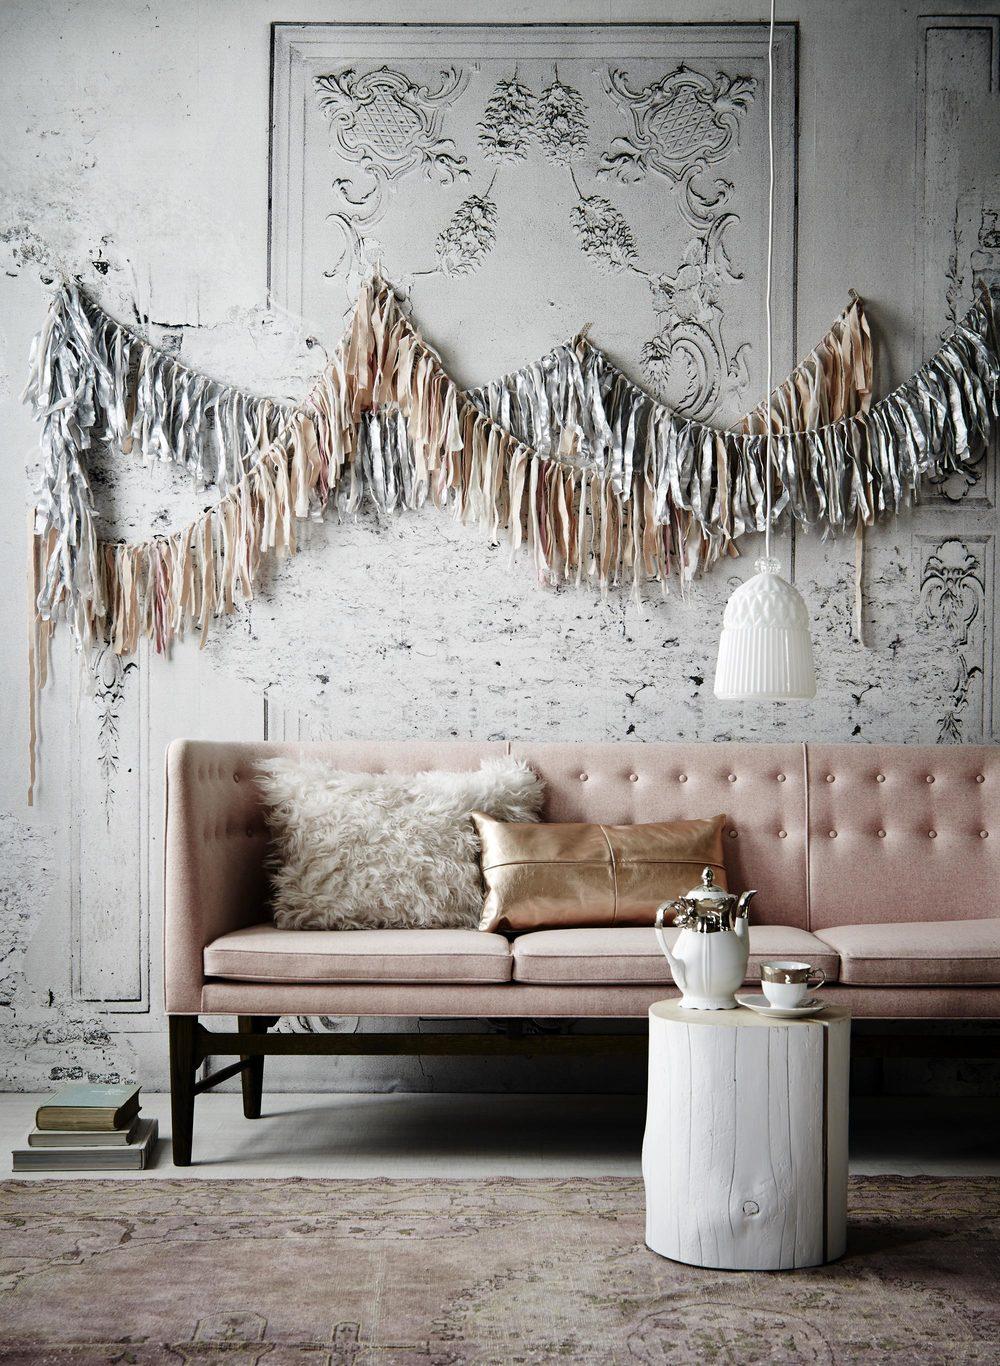 decoracion-navideña-inspo-2017-06